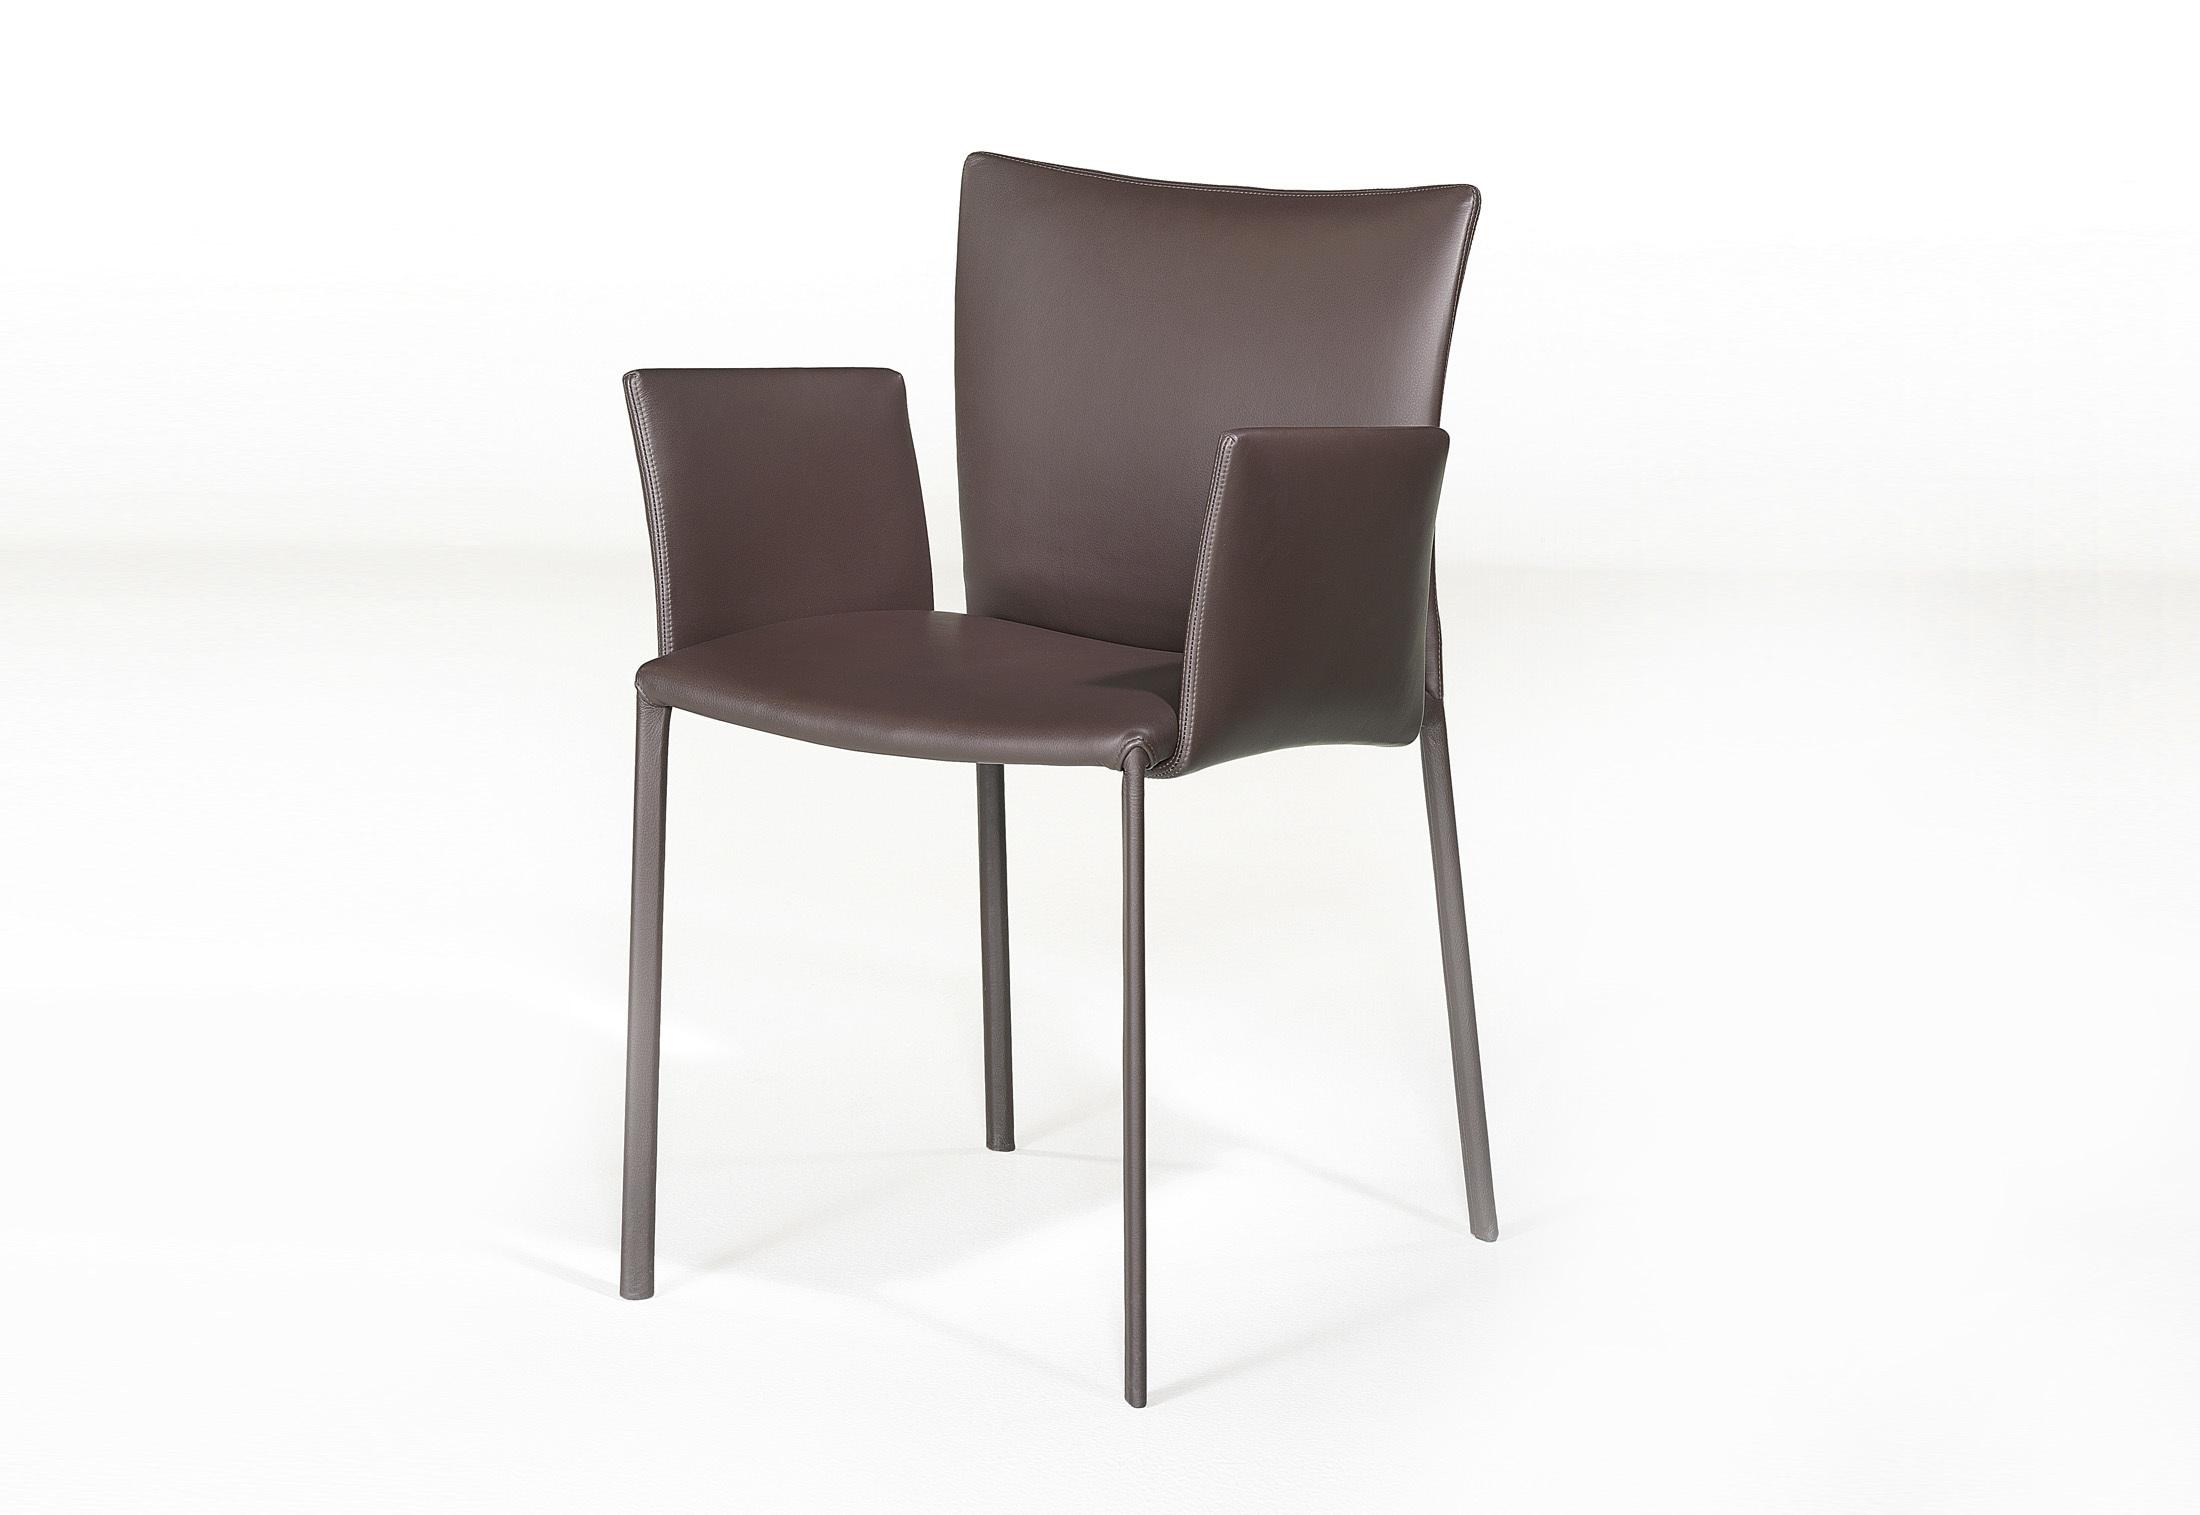 2076 nobile soft von draenert stylepark. Black Bedroom Furniture Sets. Home Design Ideas